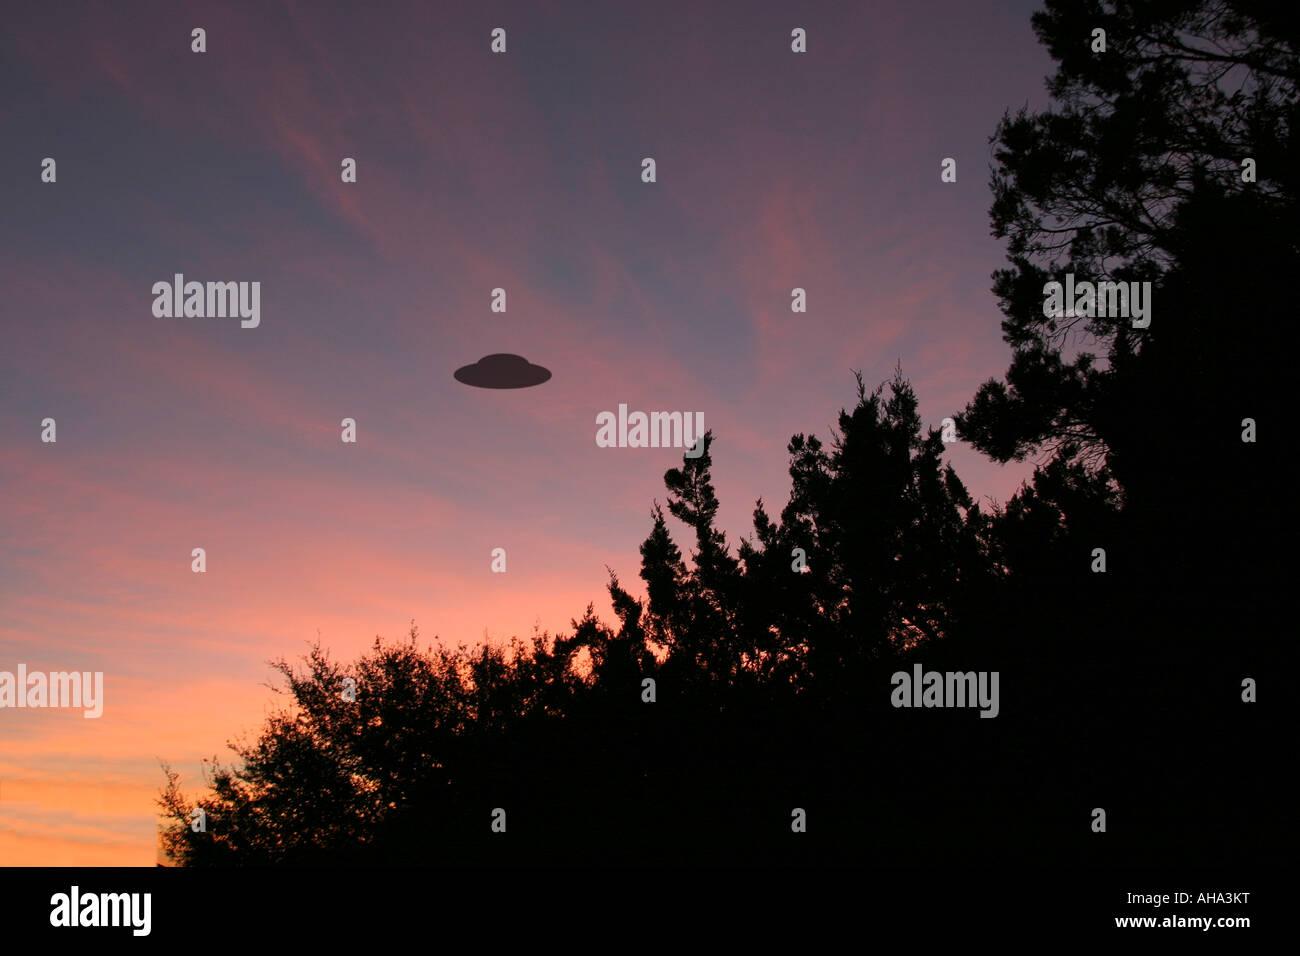 UFO silhouette against sunrise - Stock Image